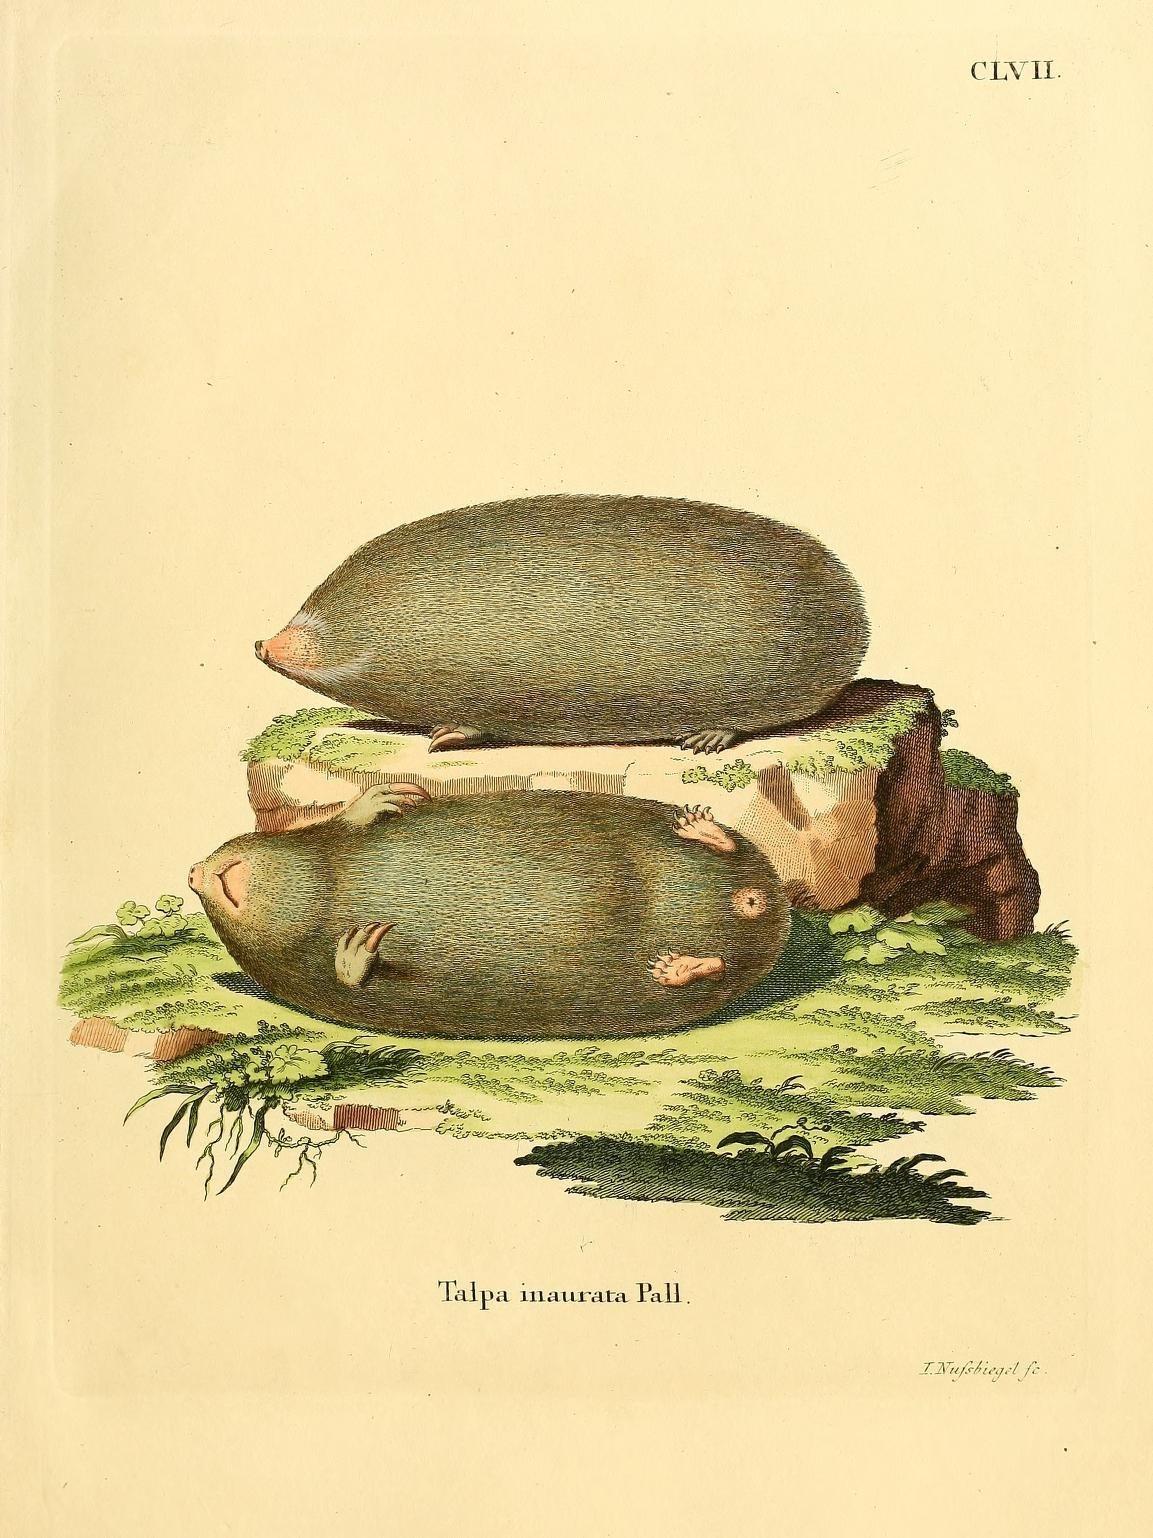 Image of Talpa